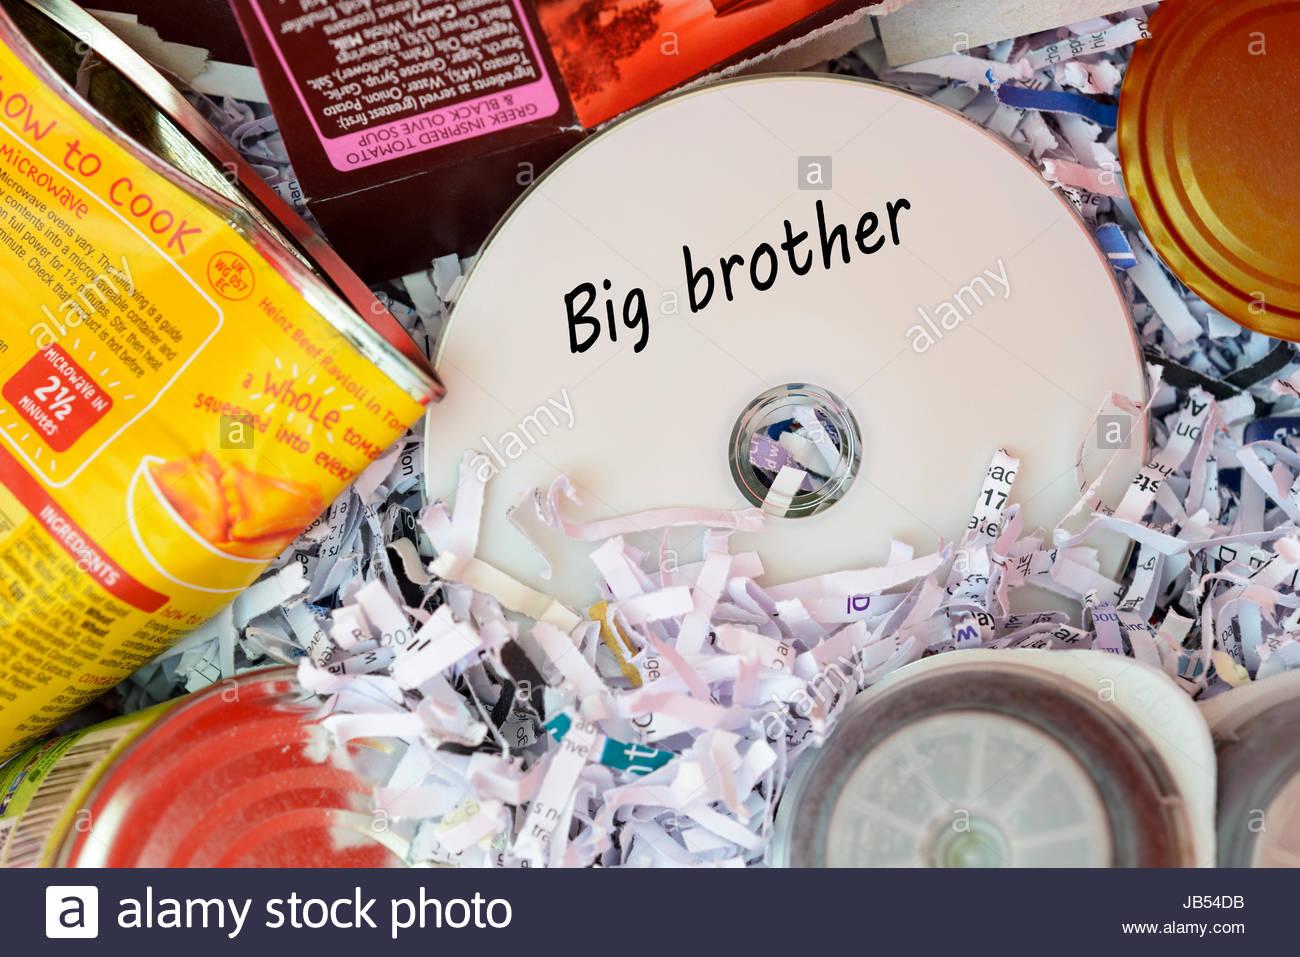 Big brother, data disc thrown in Bin, Dorset, England. - Stock Image